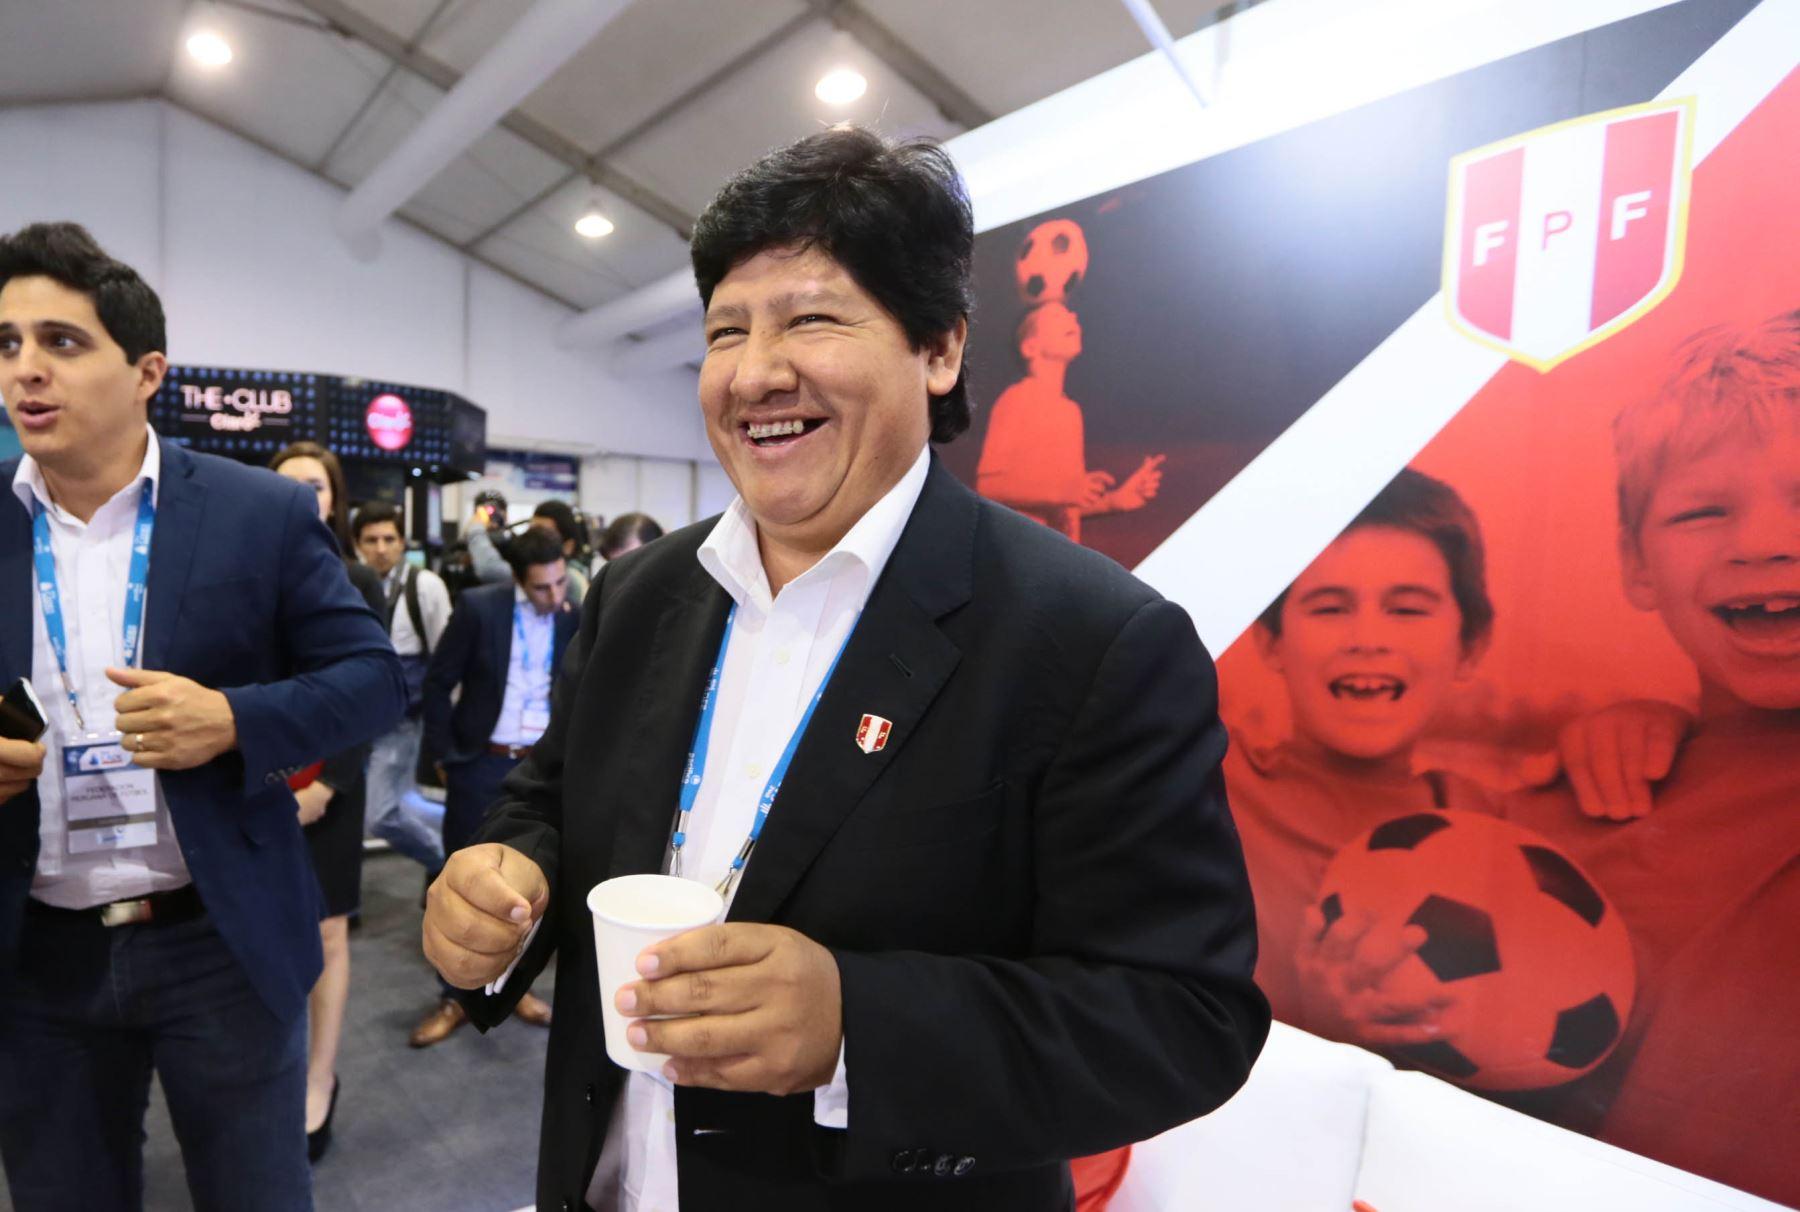 Presidente de la FPF, Edwin Oviedo. Foto: ANDINA/Carlos Lezama.